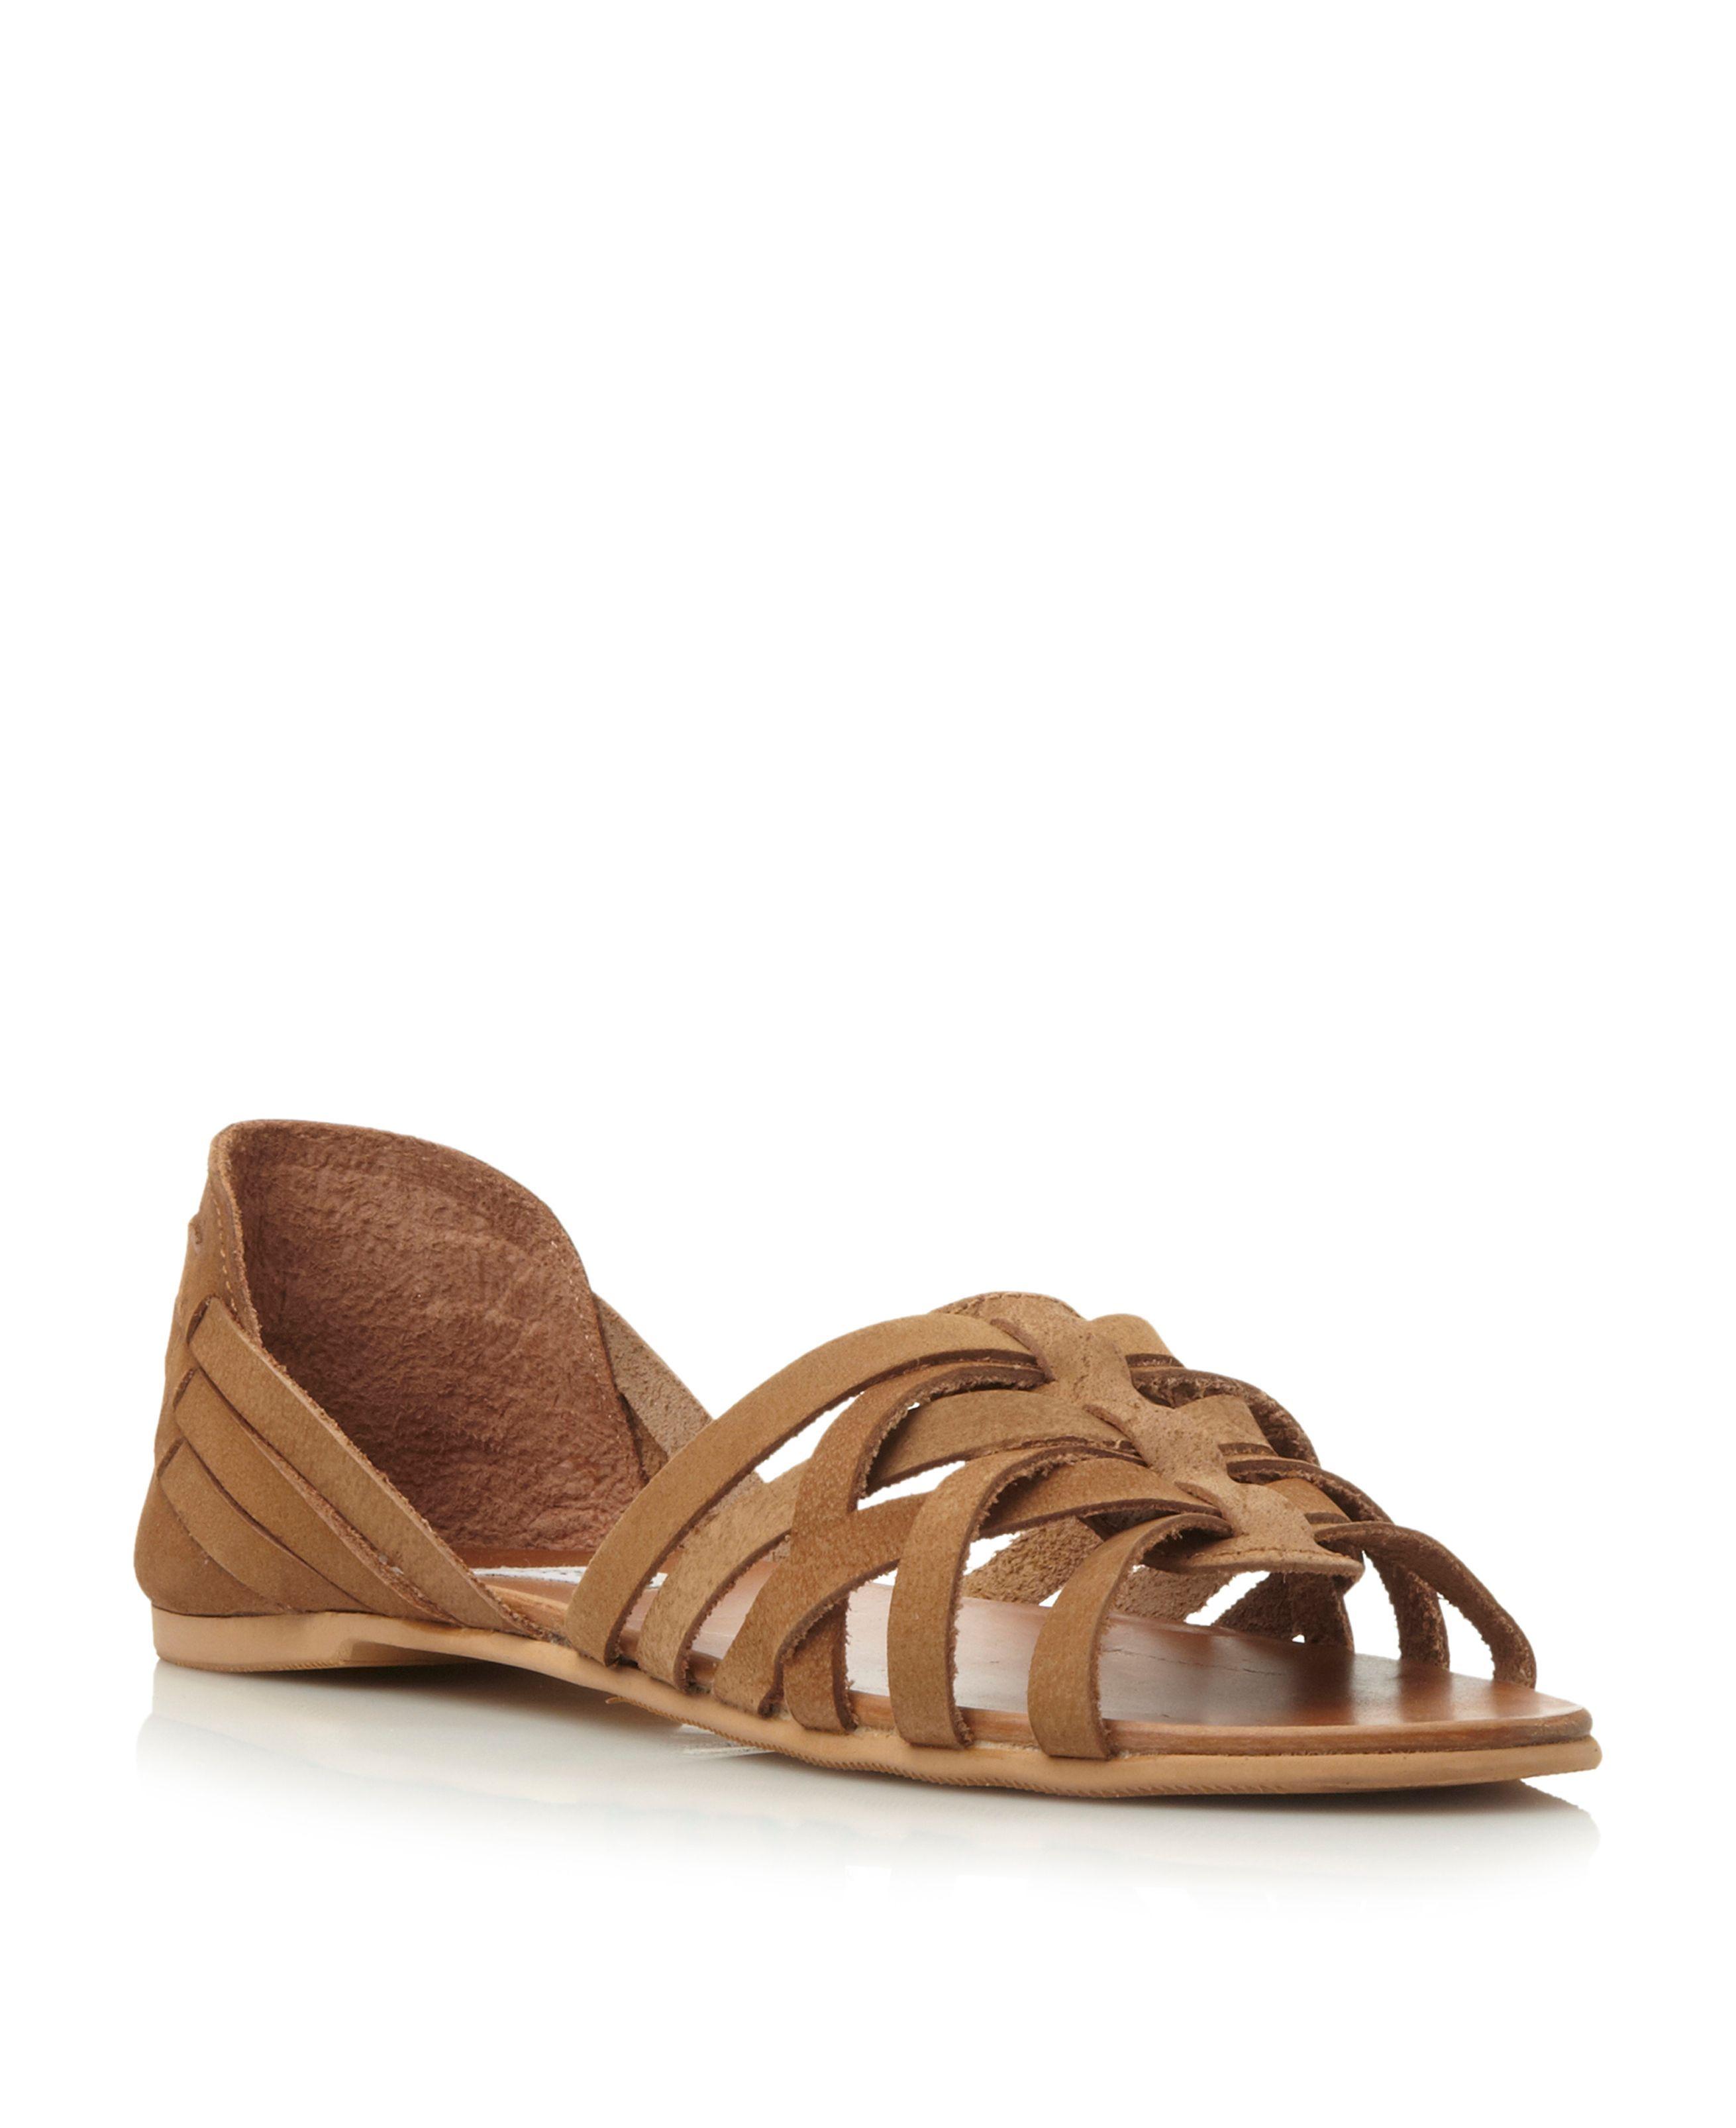 4cdc0063589 Steve Madden Flute sm leather huarache sandals, Brown | Ladies Shoes